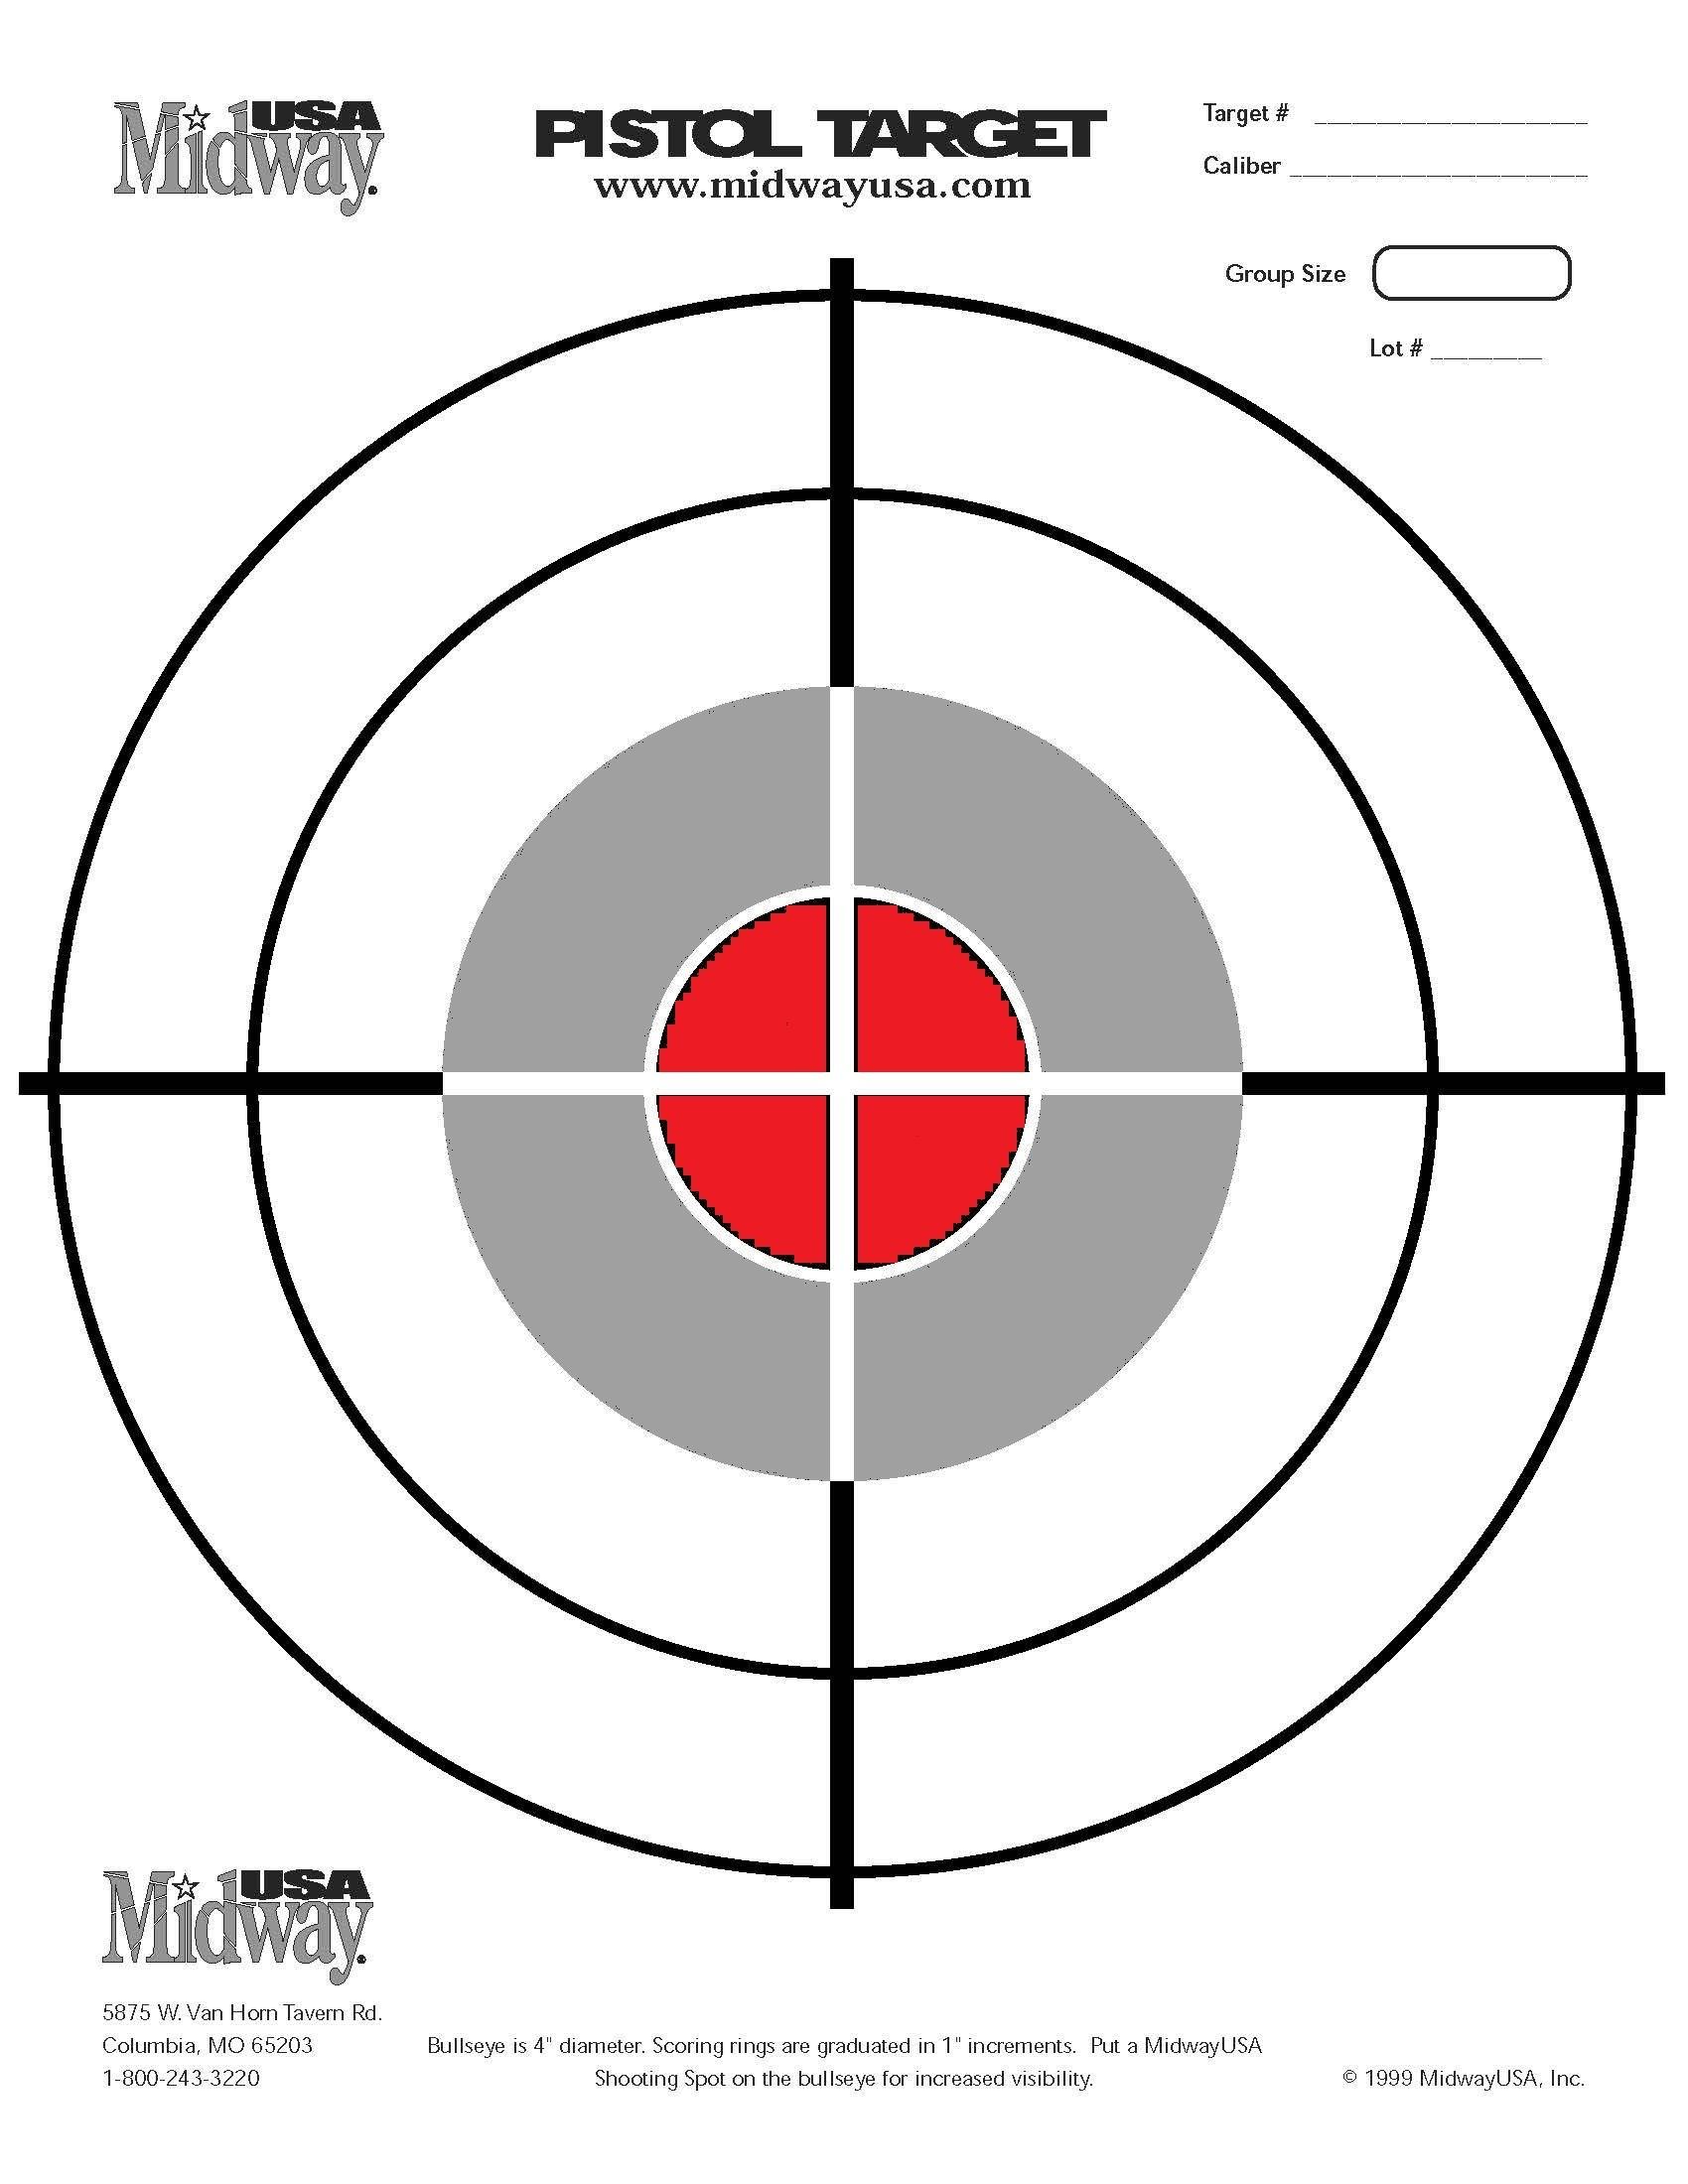 60 Fun Printable Targets   Kittybabylove - Free Printable Pistol Targets